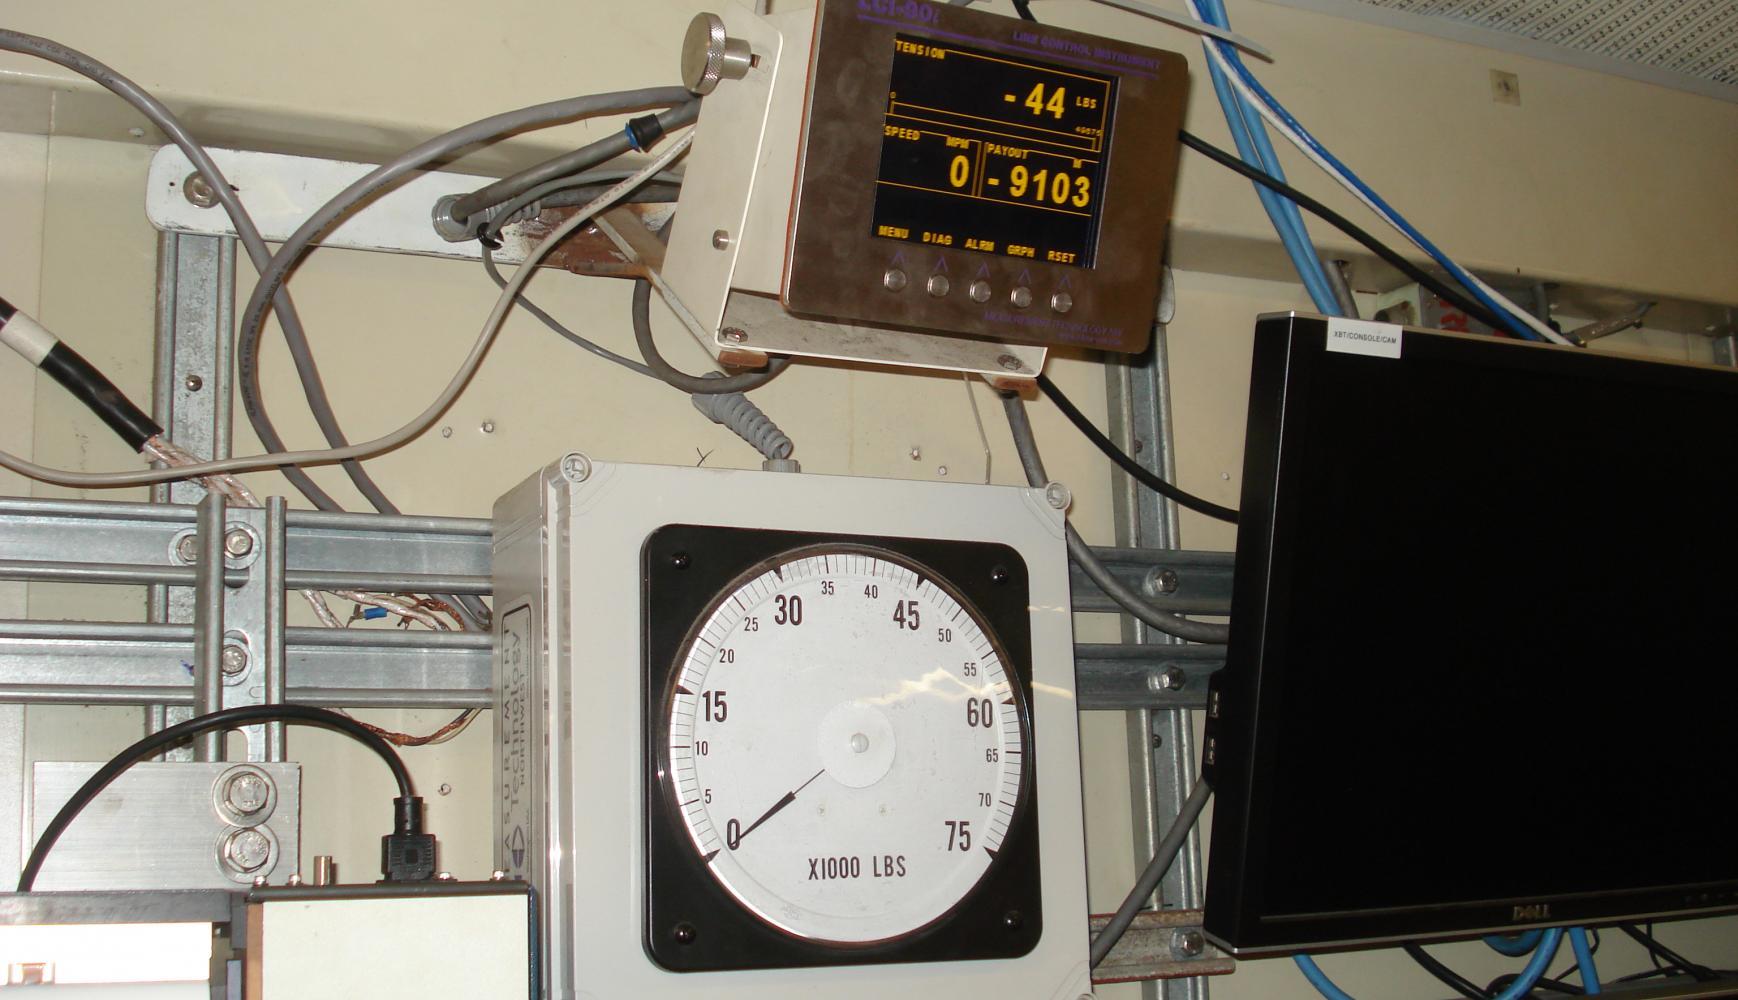 Melville Remote Display w/ Analog Meter